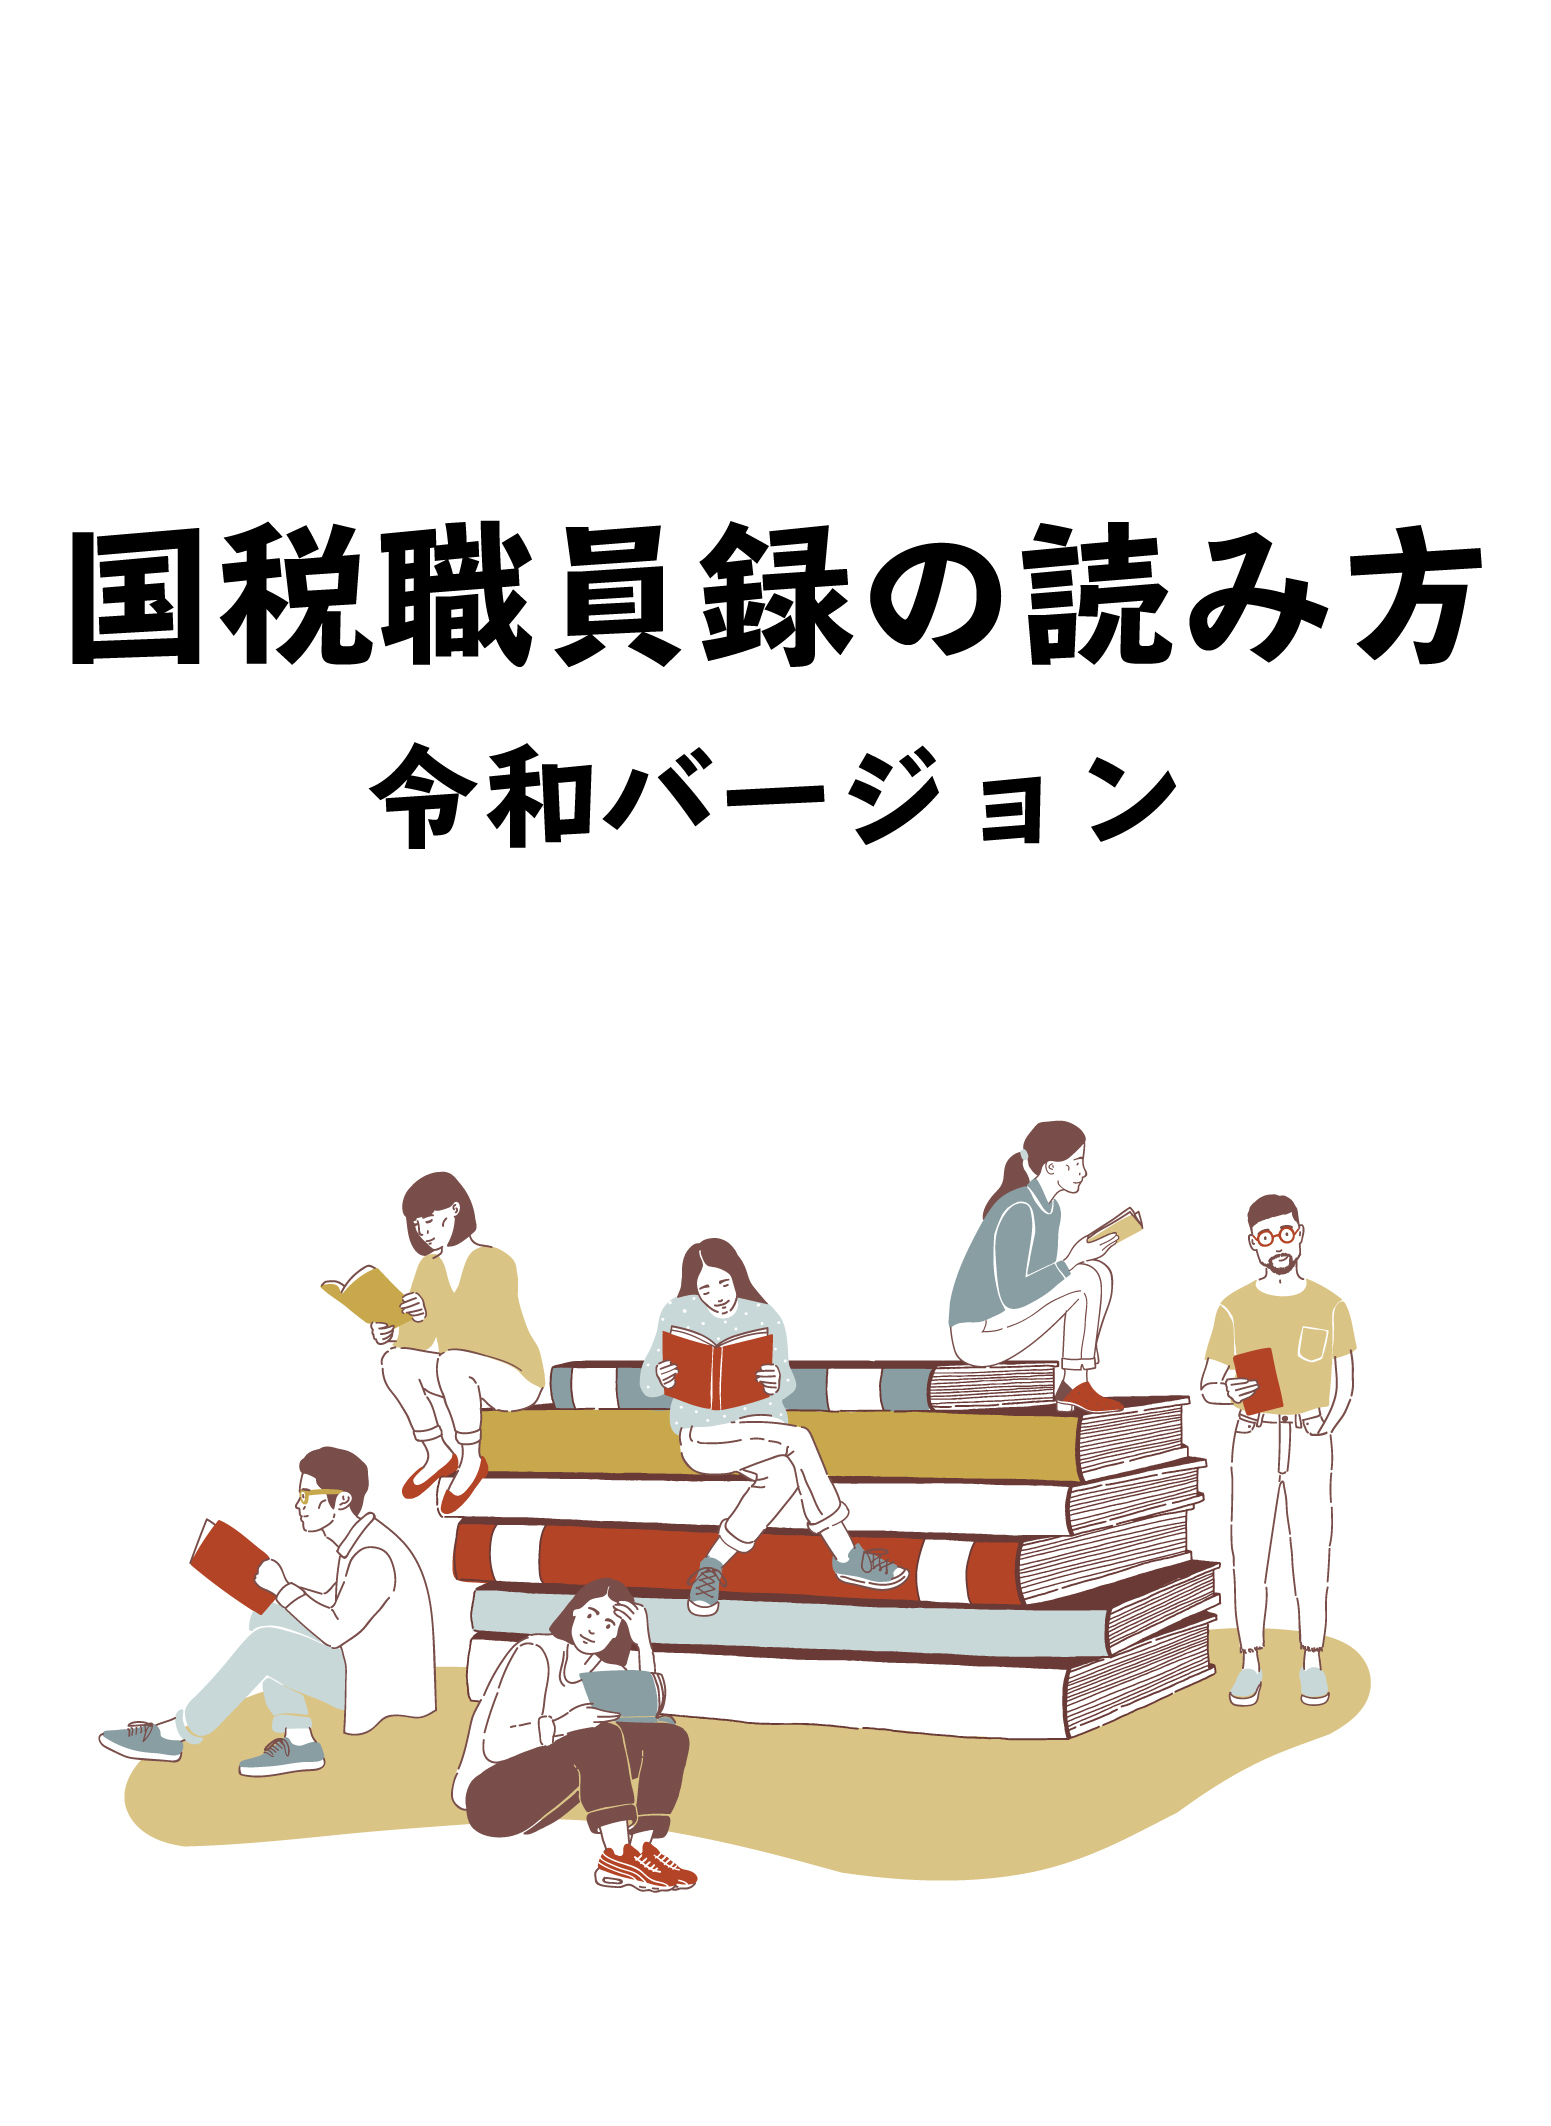 【PDF】「国税職員録の読み方」令和バージョン